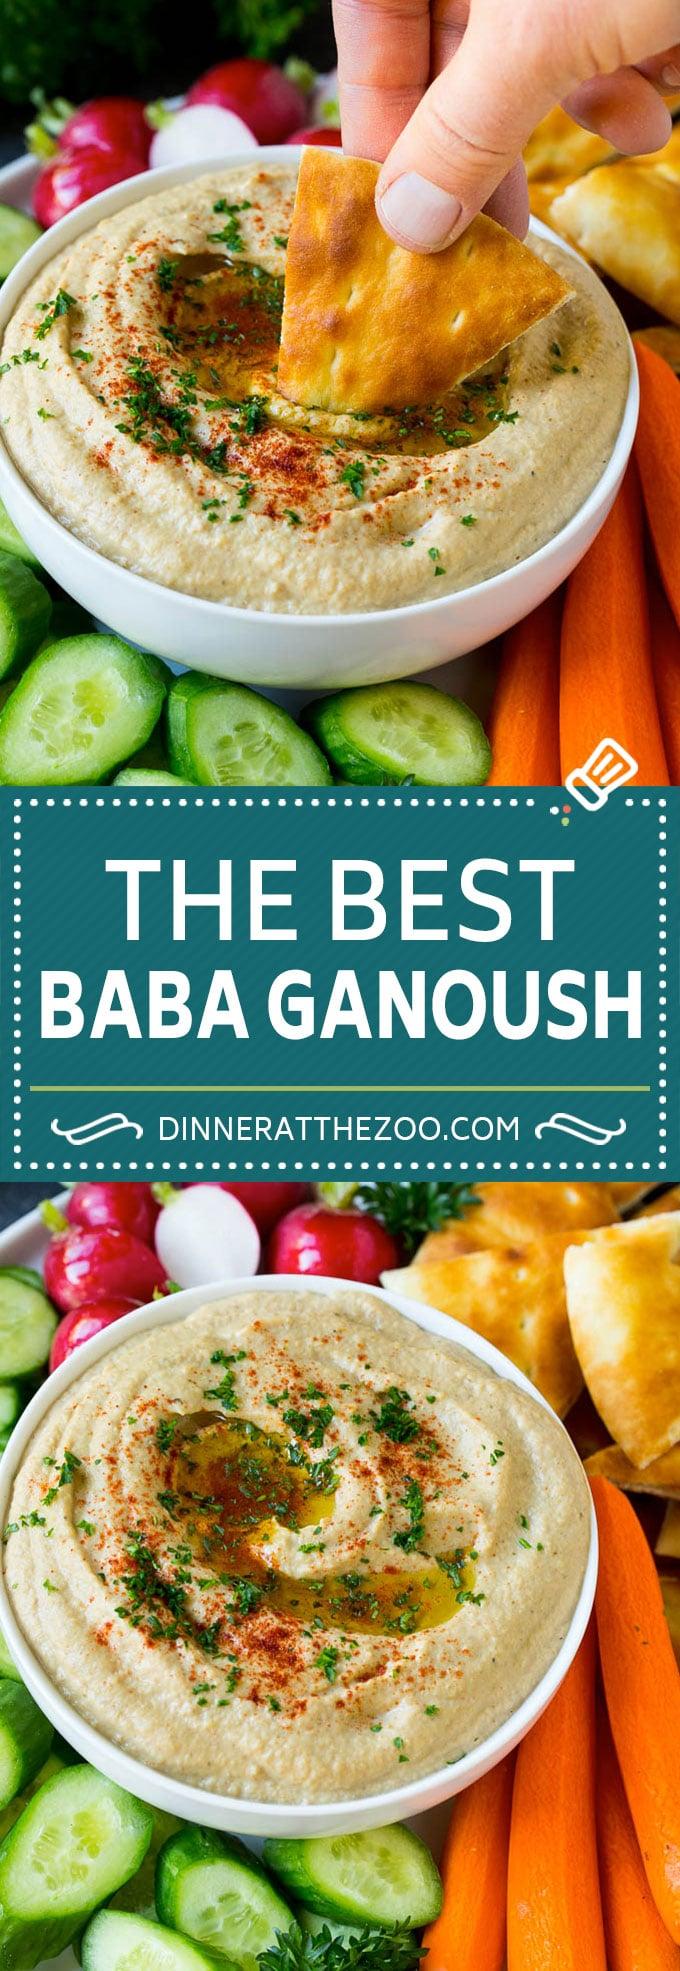 Baba Ganoush Recipe | Eggplant Dip #eggplant #appetizer #dip #healthy #glutenfree #lowcarb #dinneratthezoo